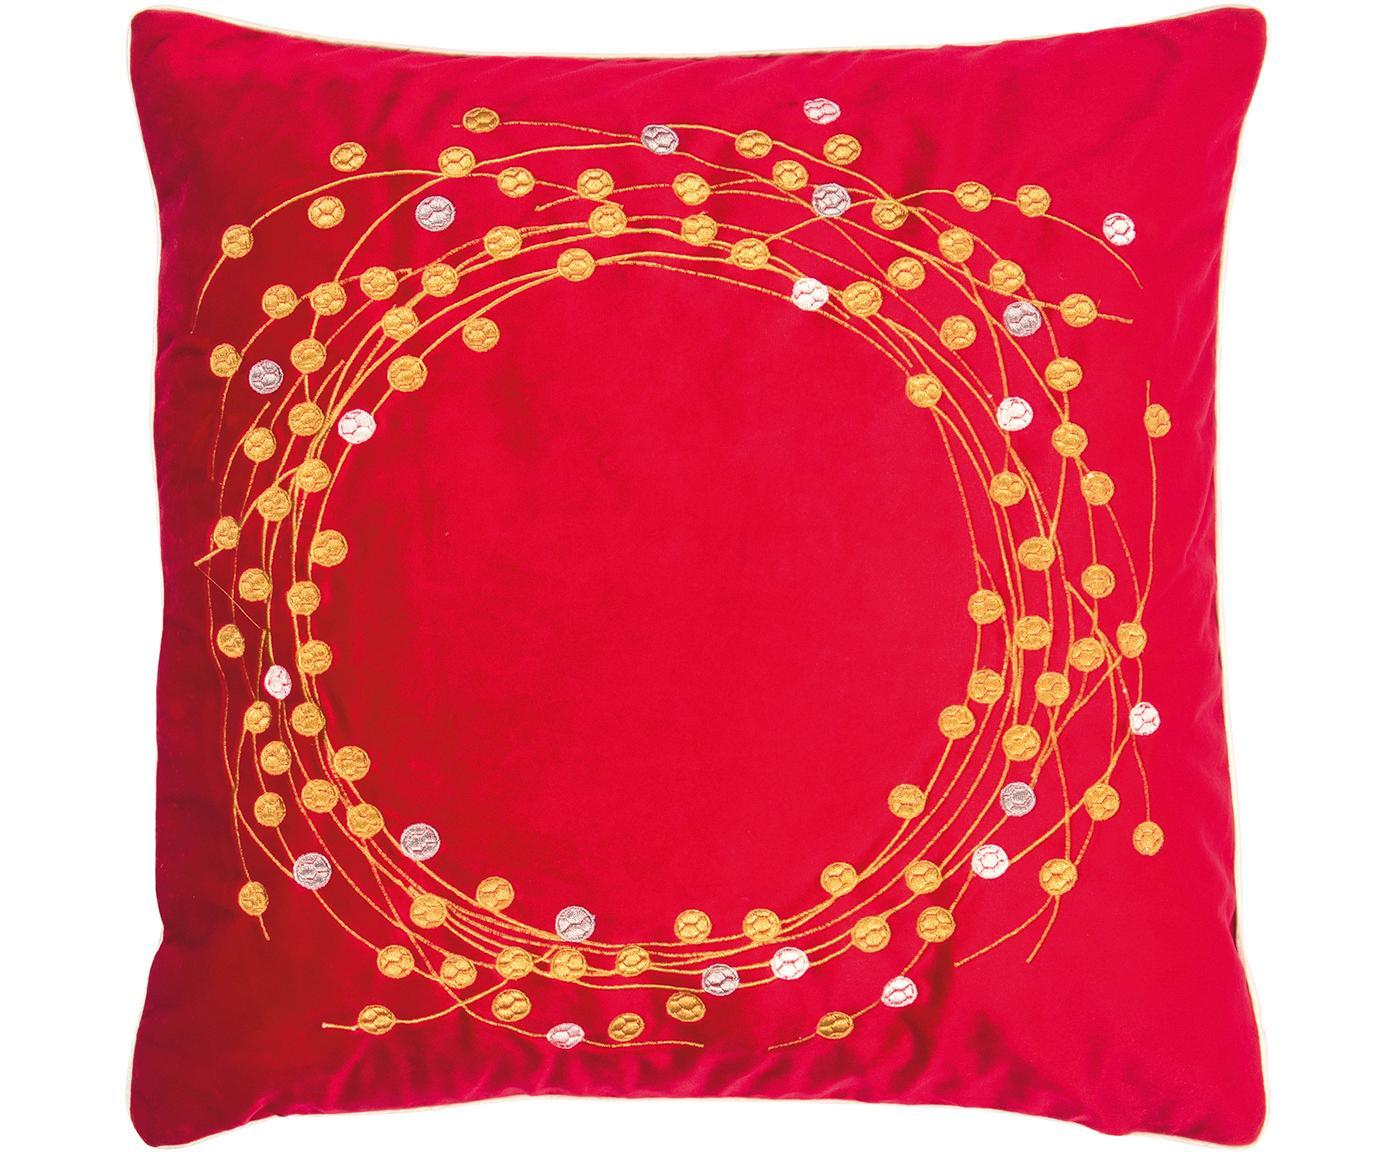 Fluwelen kussenhoes Circle, Polyester fluweel, Rood, goudkleurig, 45 x 45 cm